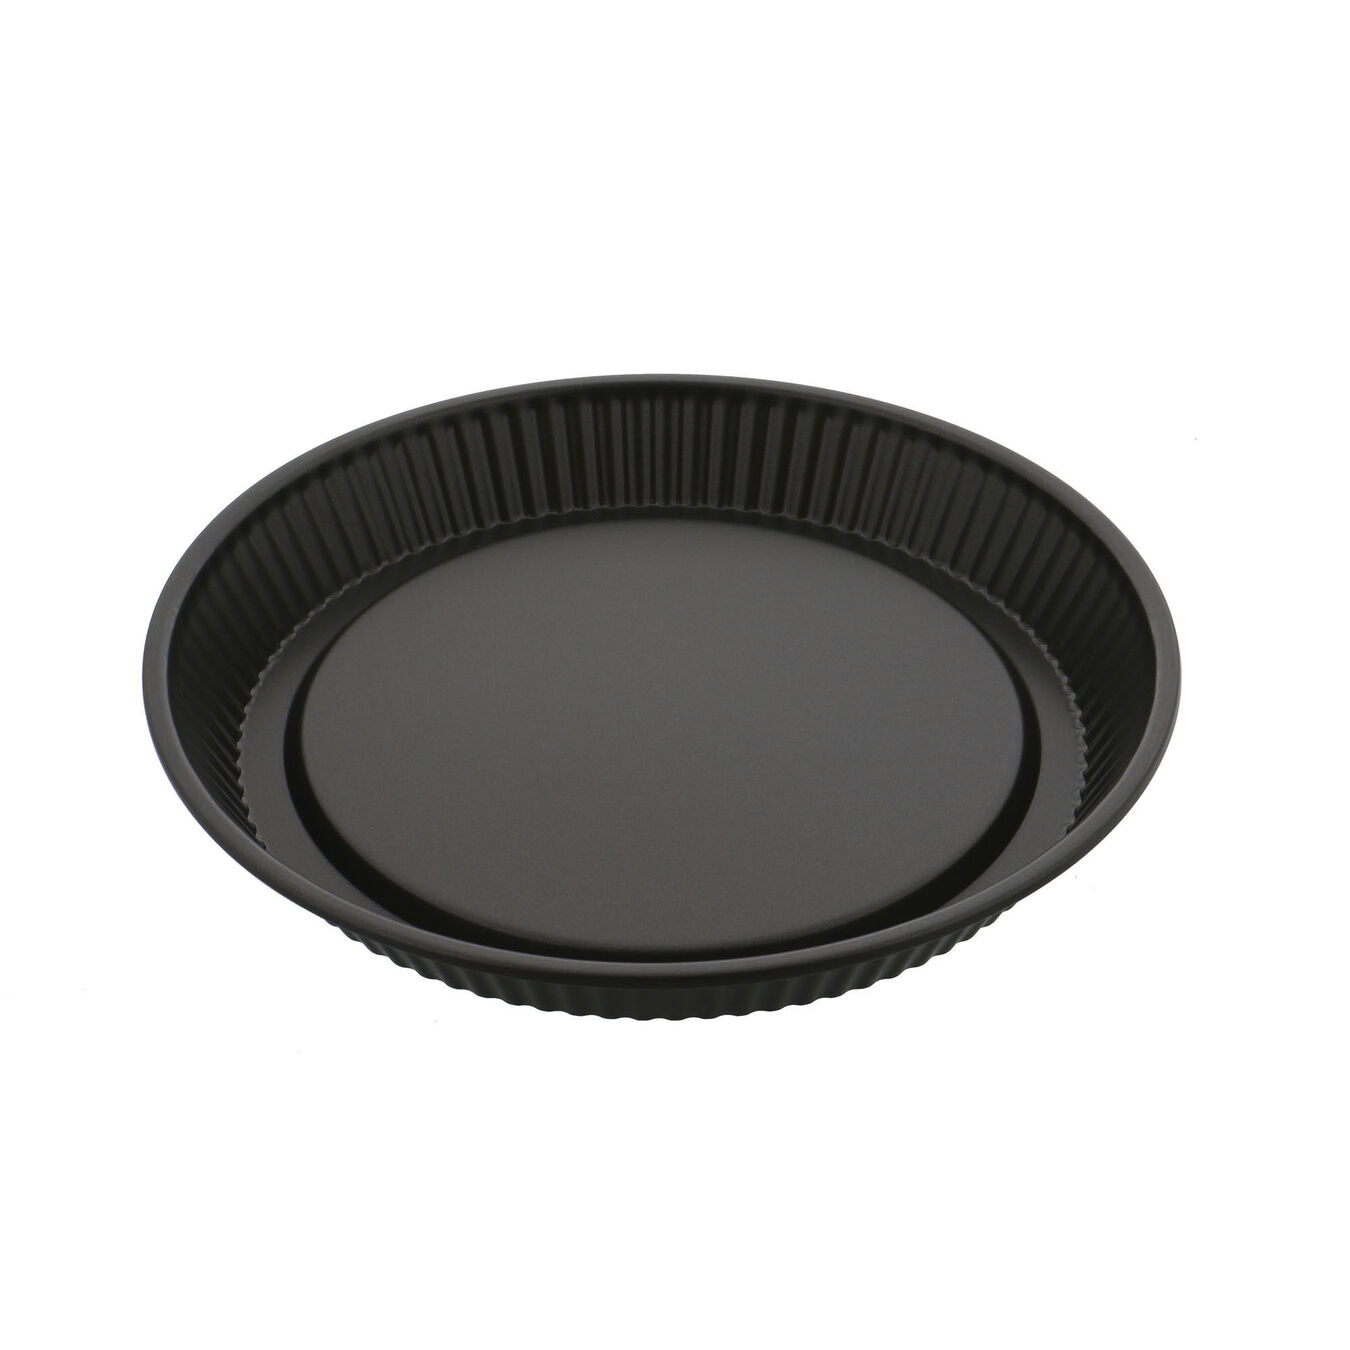 11-inch, Pie dish, black matte,,large 1